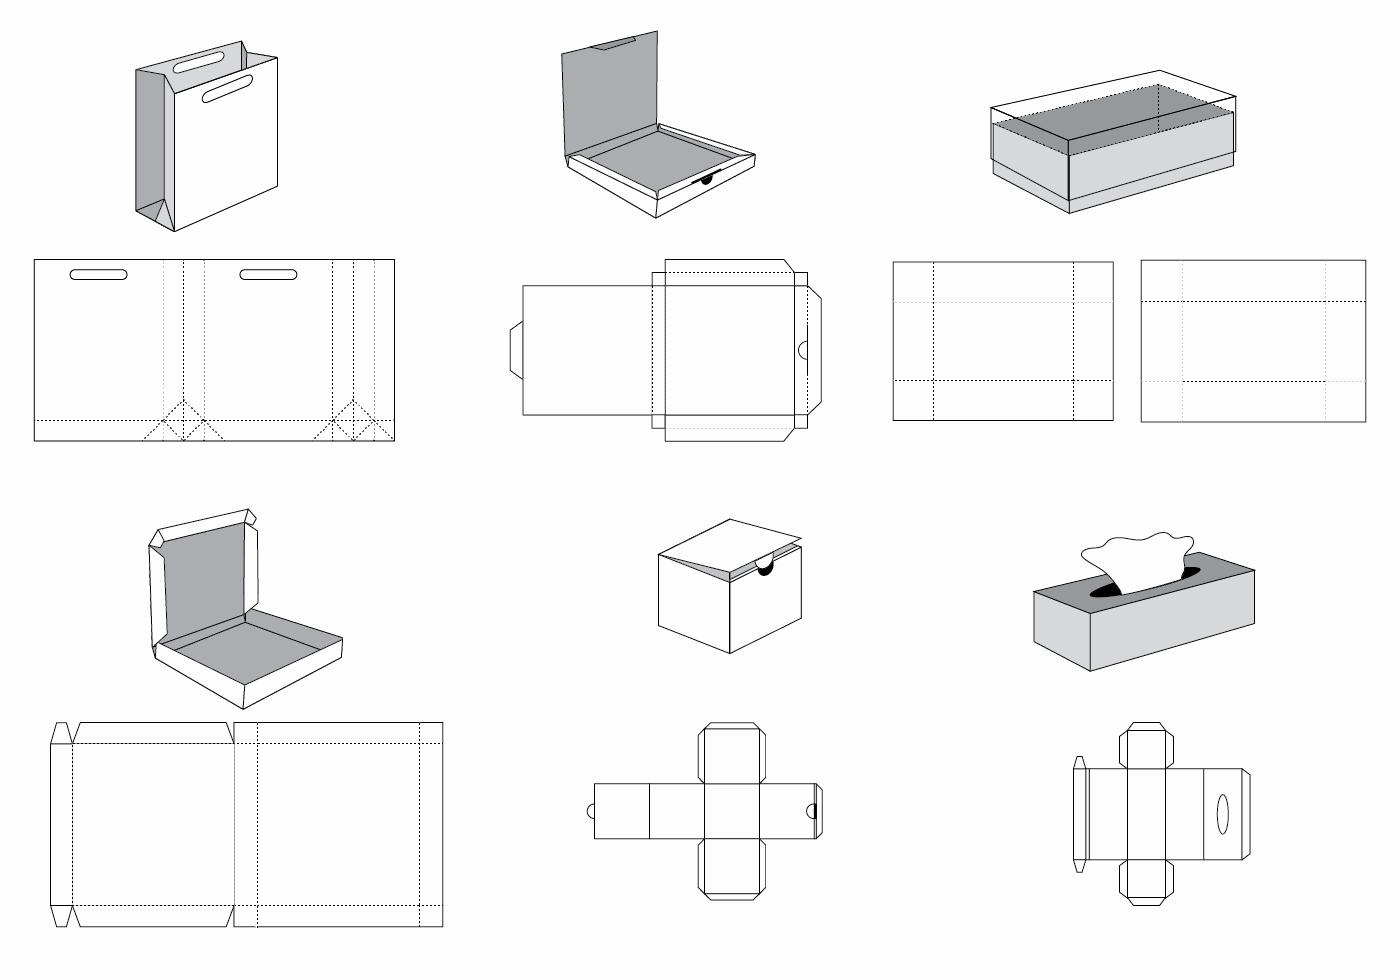 Box Die Cut Template Inspirational Free Die Cut Vector Download Free Vectors Clipart Graphics & Vector Art